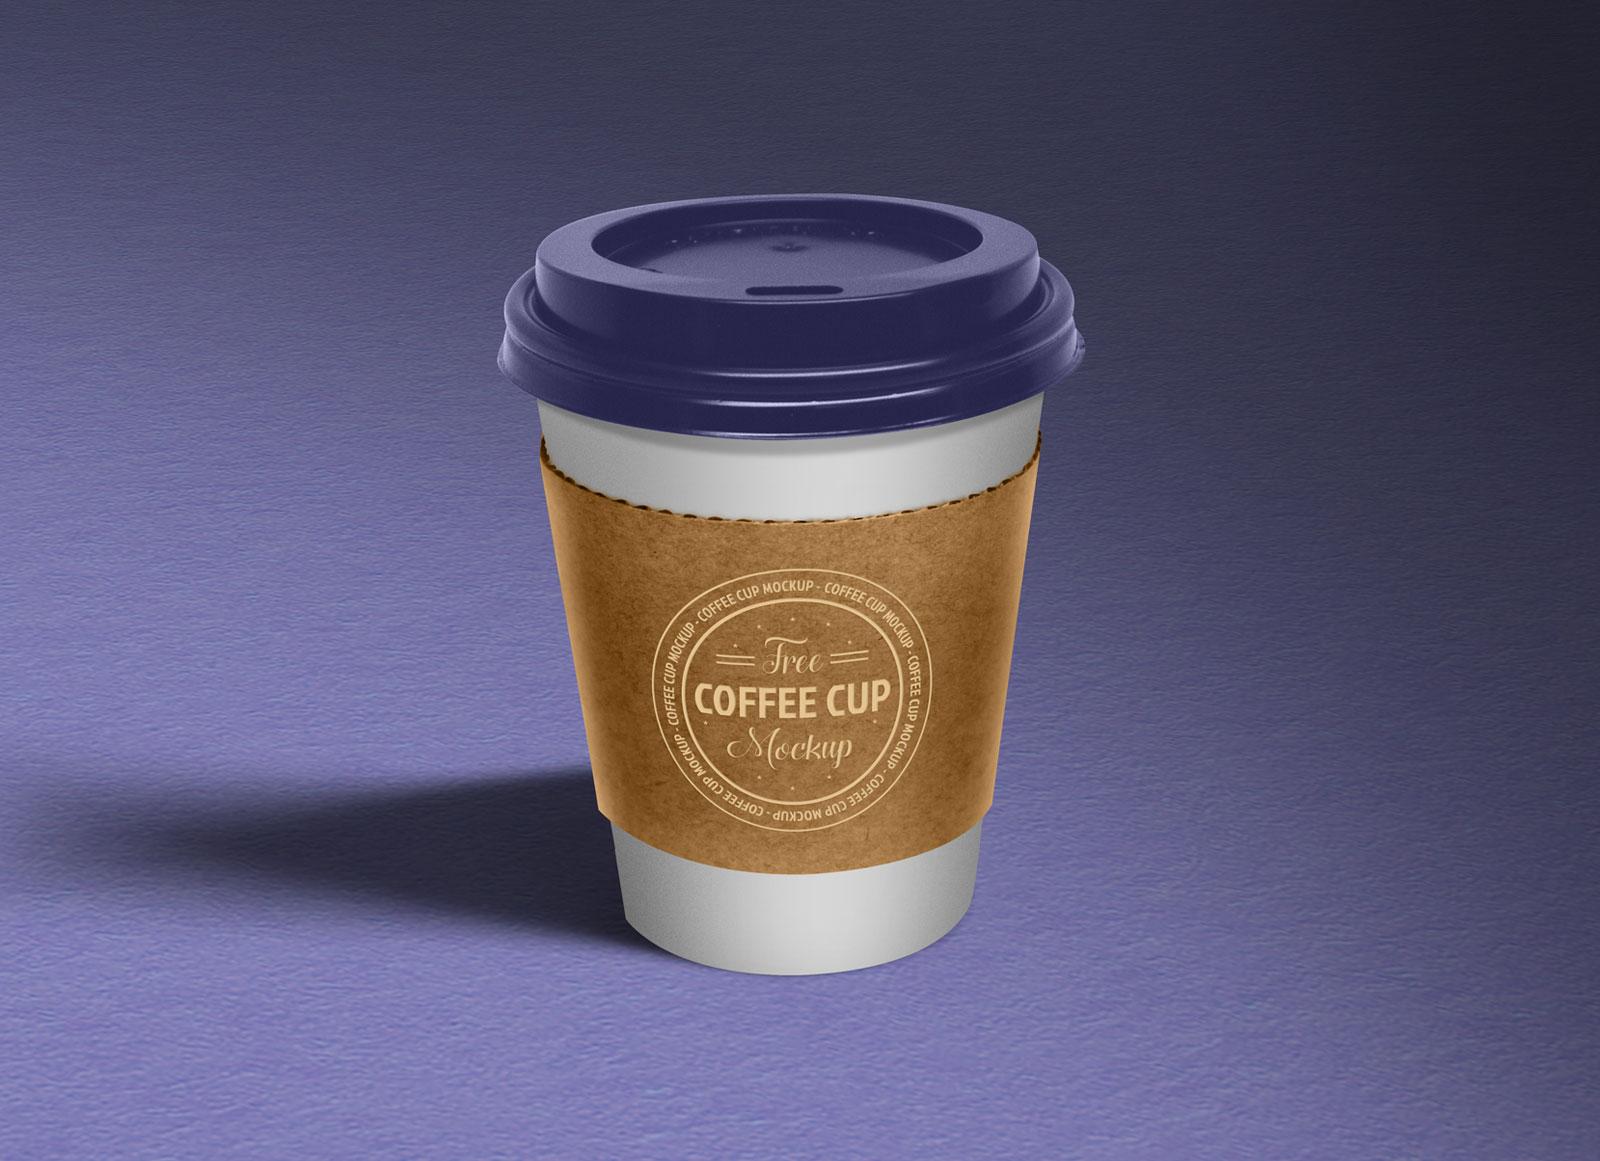 Free Paper Coffee Cup Sleeve Mockup PSD - Good Mockups